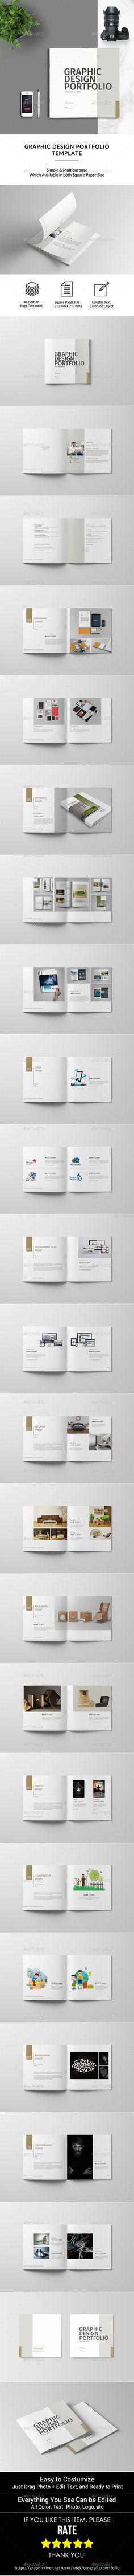 #creative #Graphic #Design #Portfolio #Template - #professional #modern Portfolio #Brochures #design. download here: https://graphicriver.net/item/graphic-design-portfolio-template/19899858?ref=yinkira